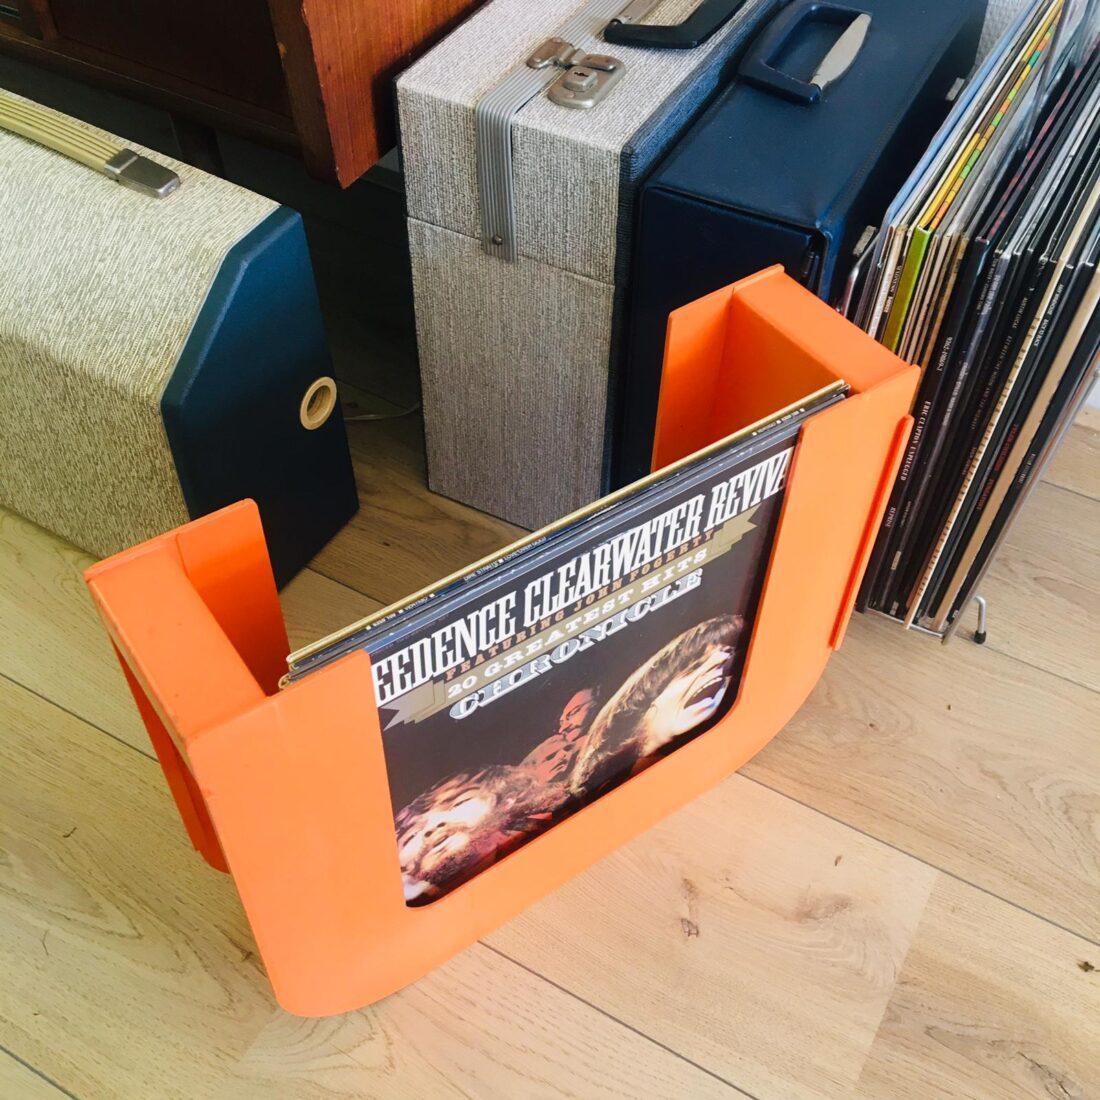 Vintage Ubox platenhouder